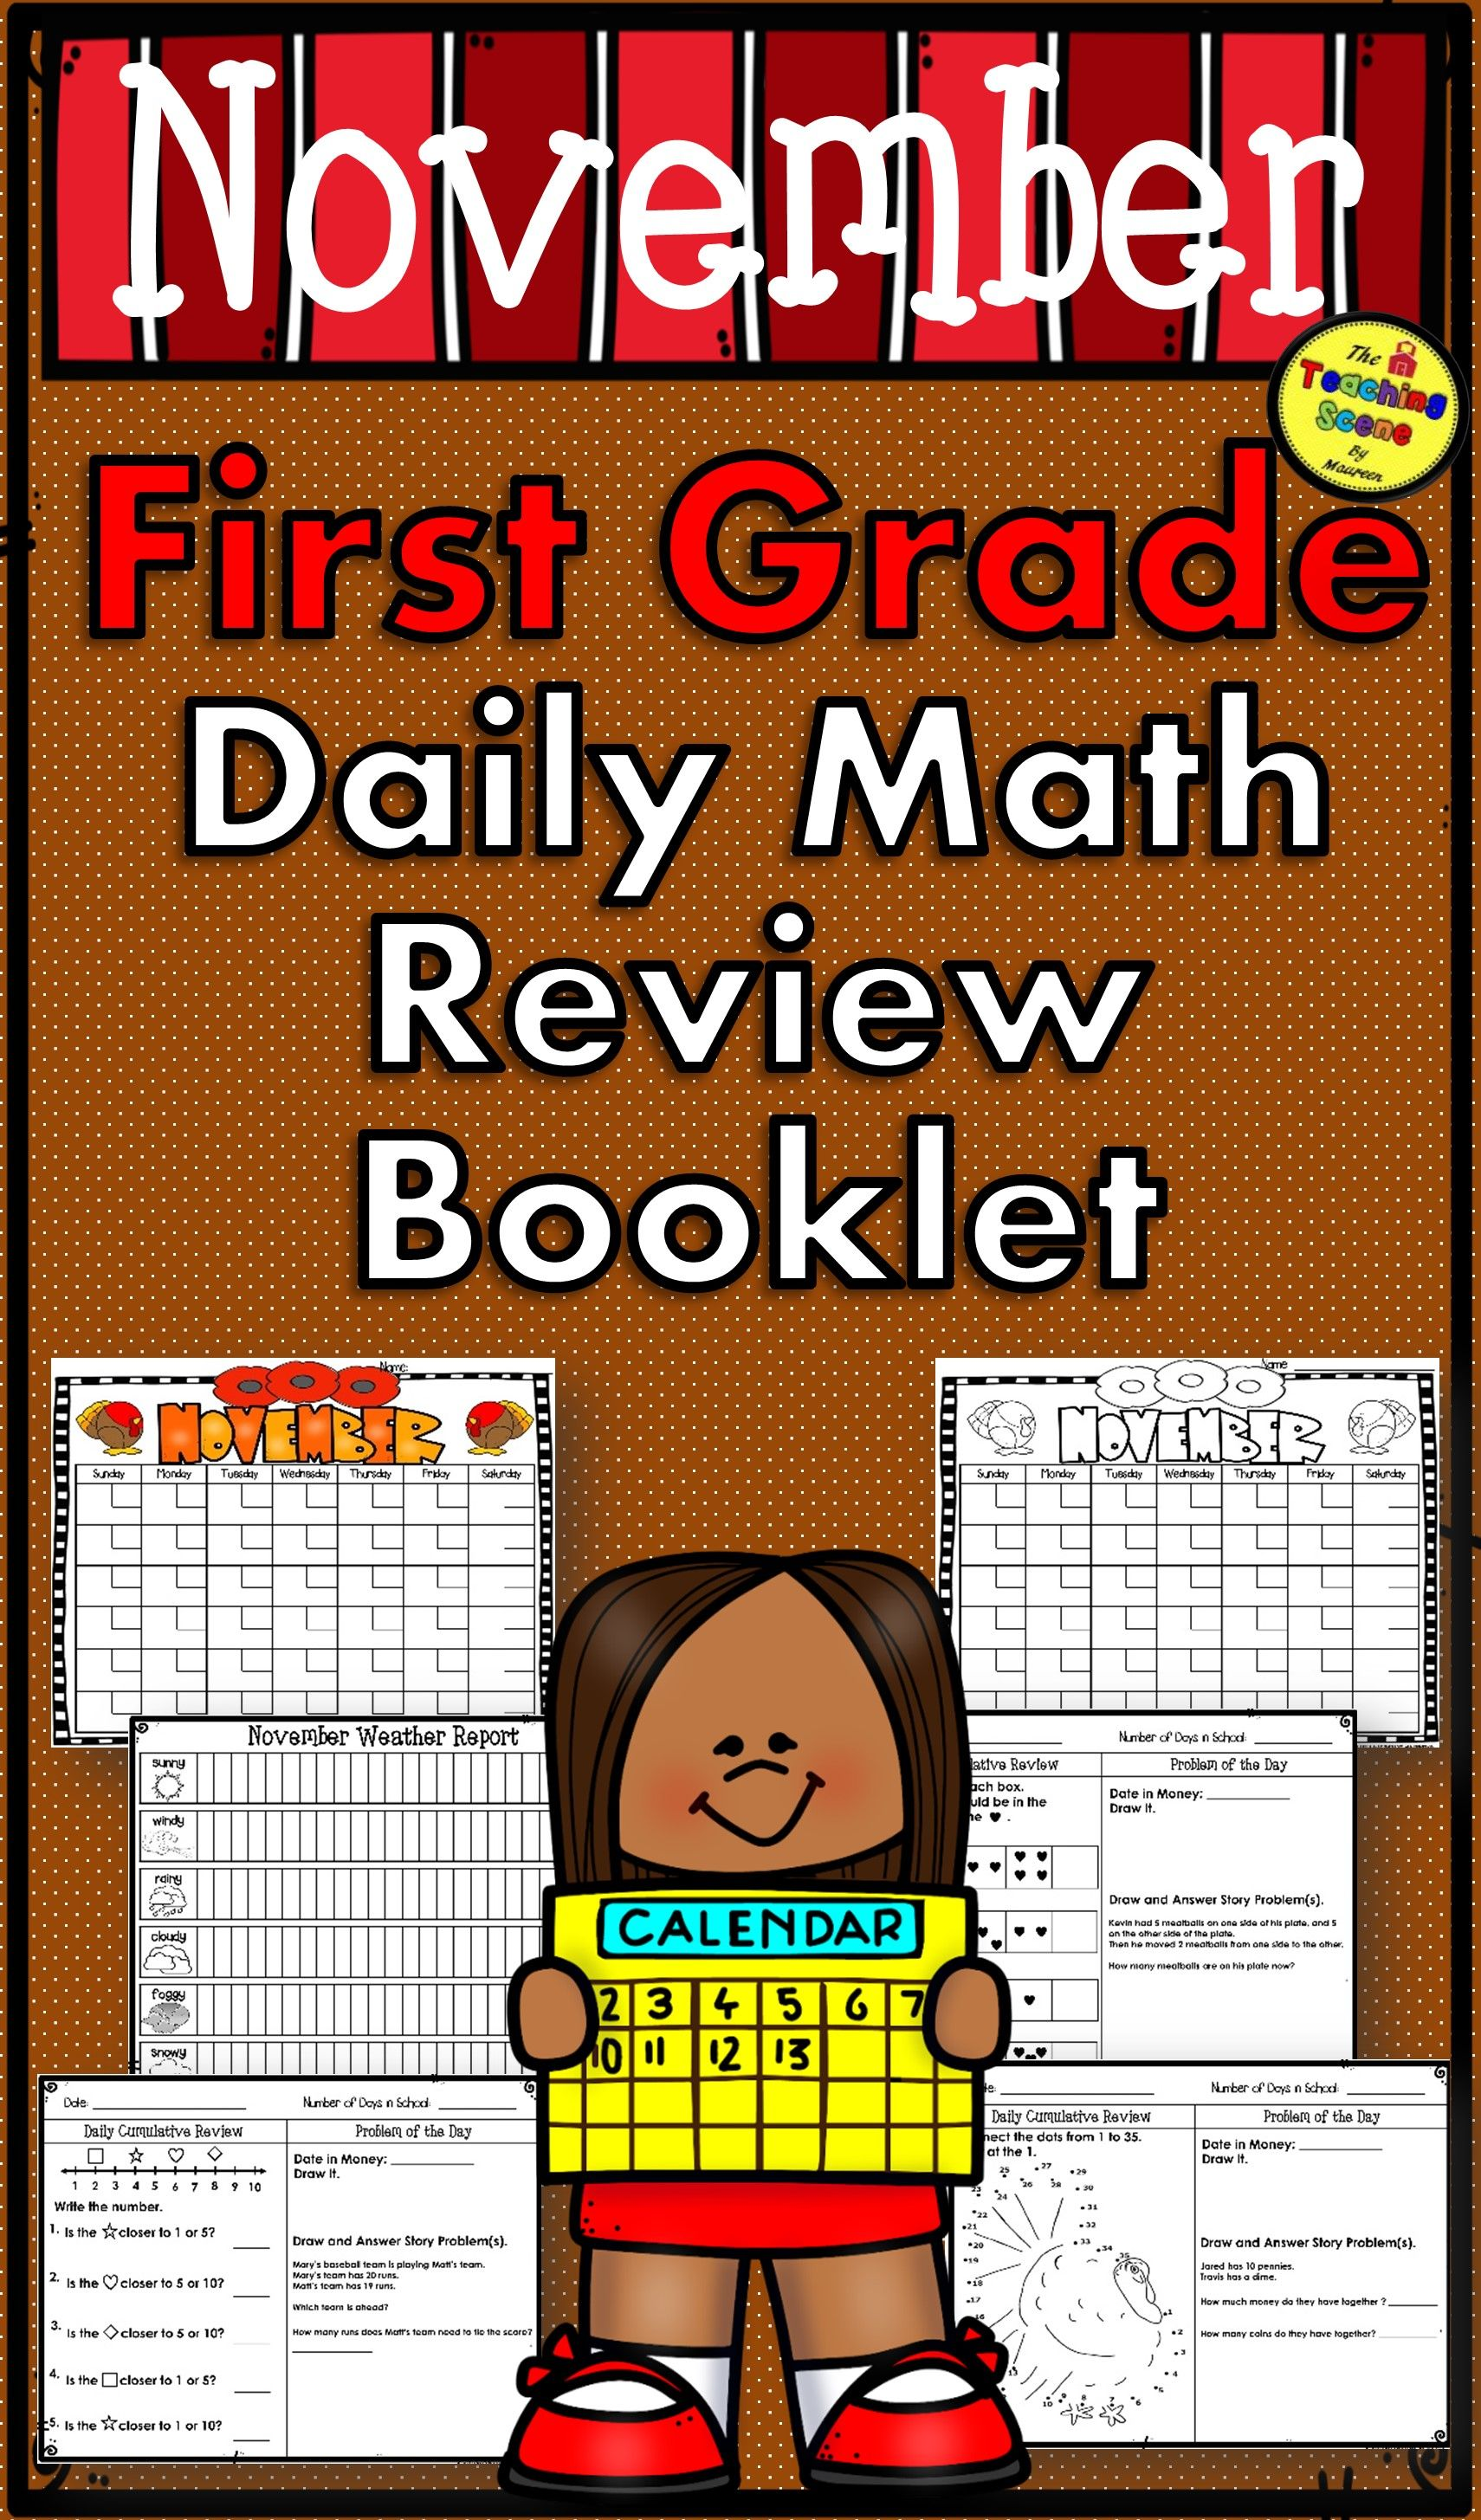 First Grade Daily Calendar Amp Math Review Booklet November